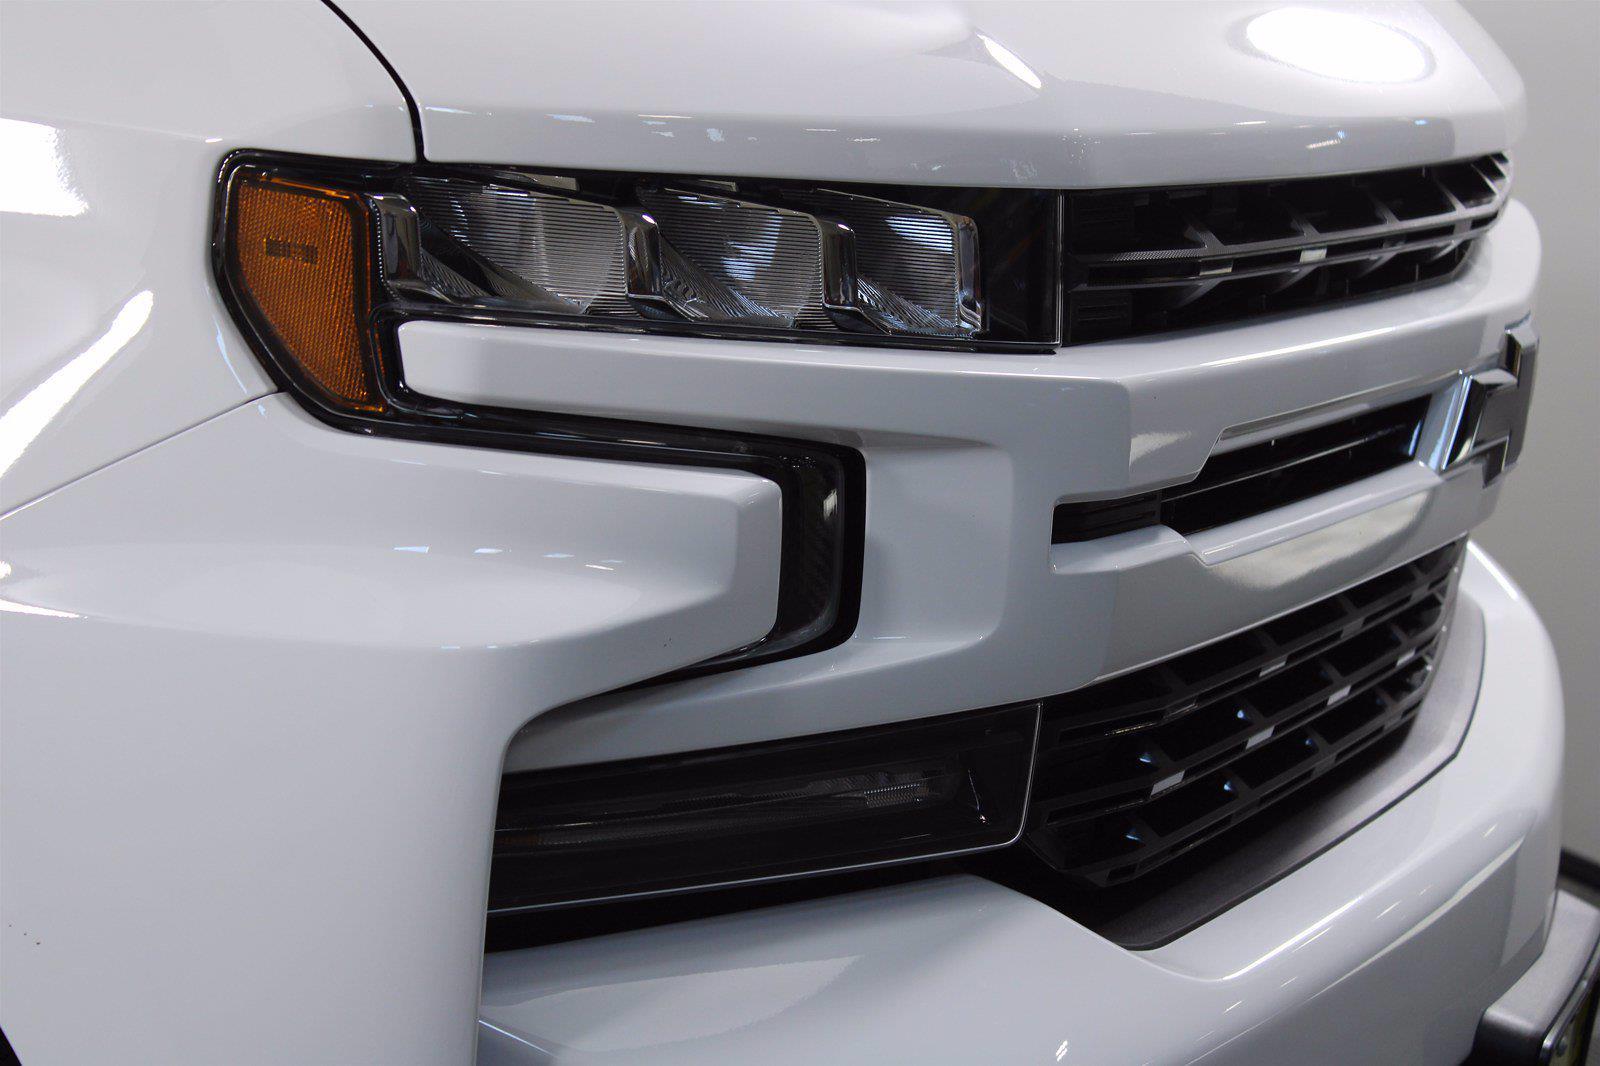 2021 Chevrolet Silverado 1500 Crew Cab 4x4, Pickup #D110898 - photo 5